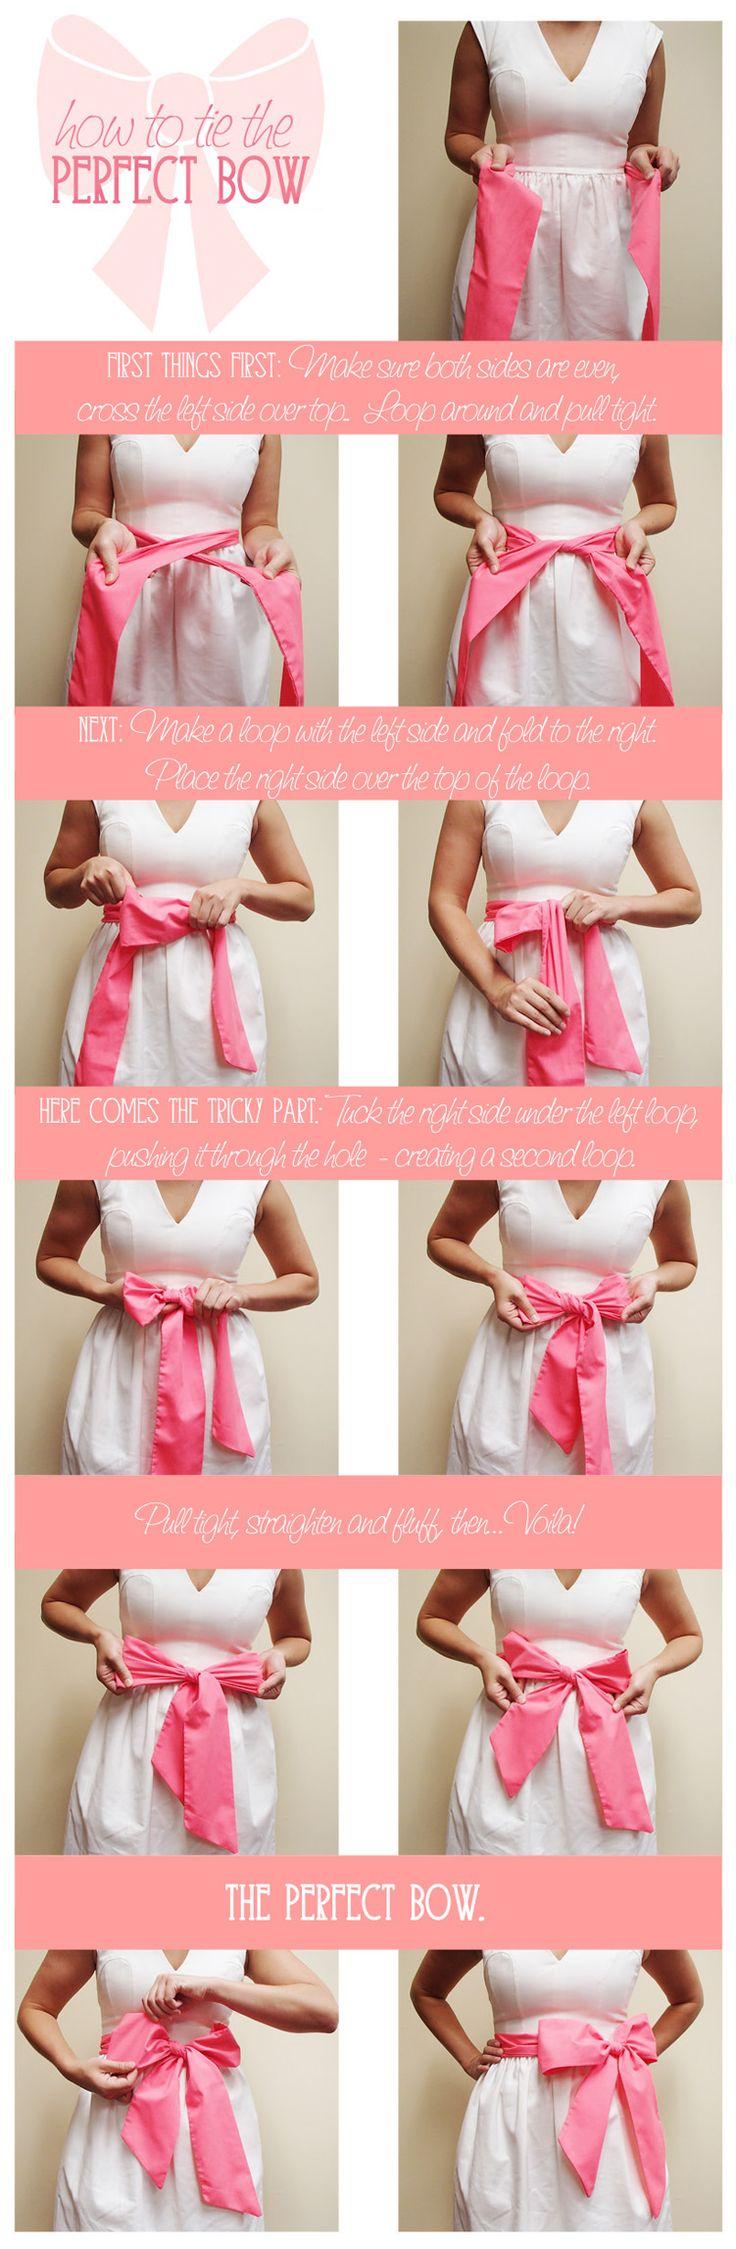 How to Tie the Perfect Bow - elle & k boutique   Women's Online Boutique